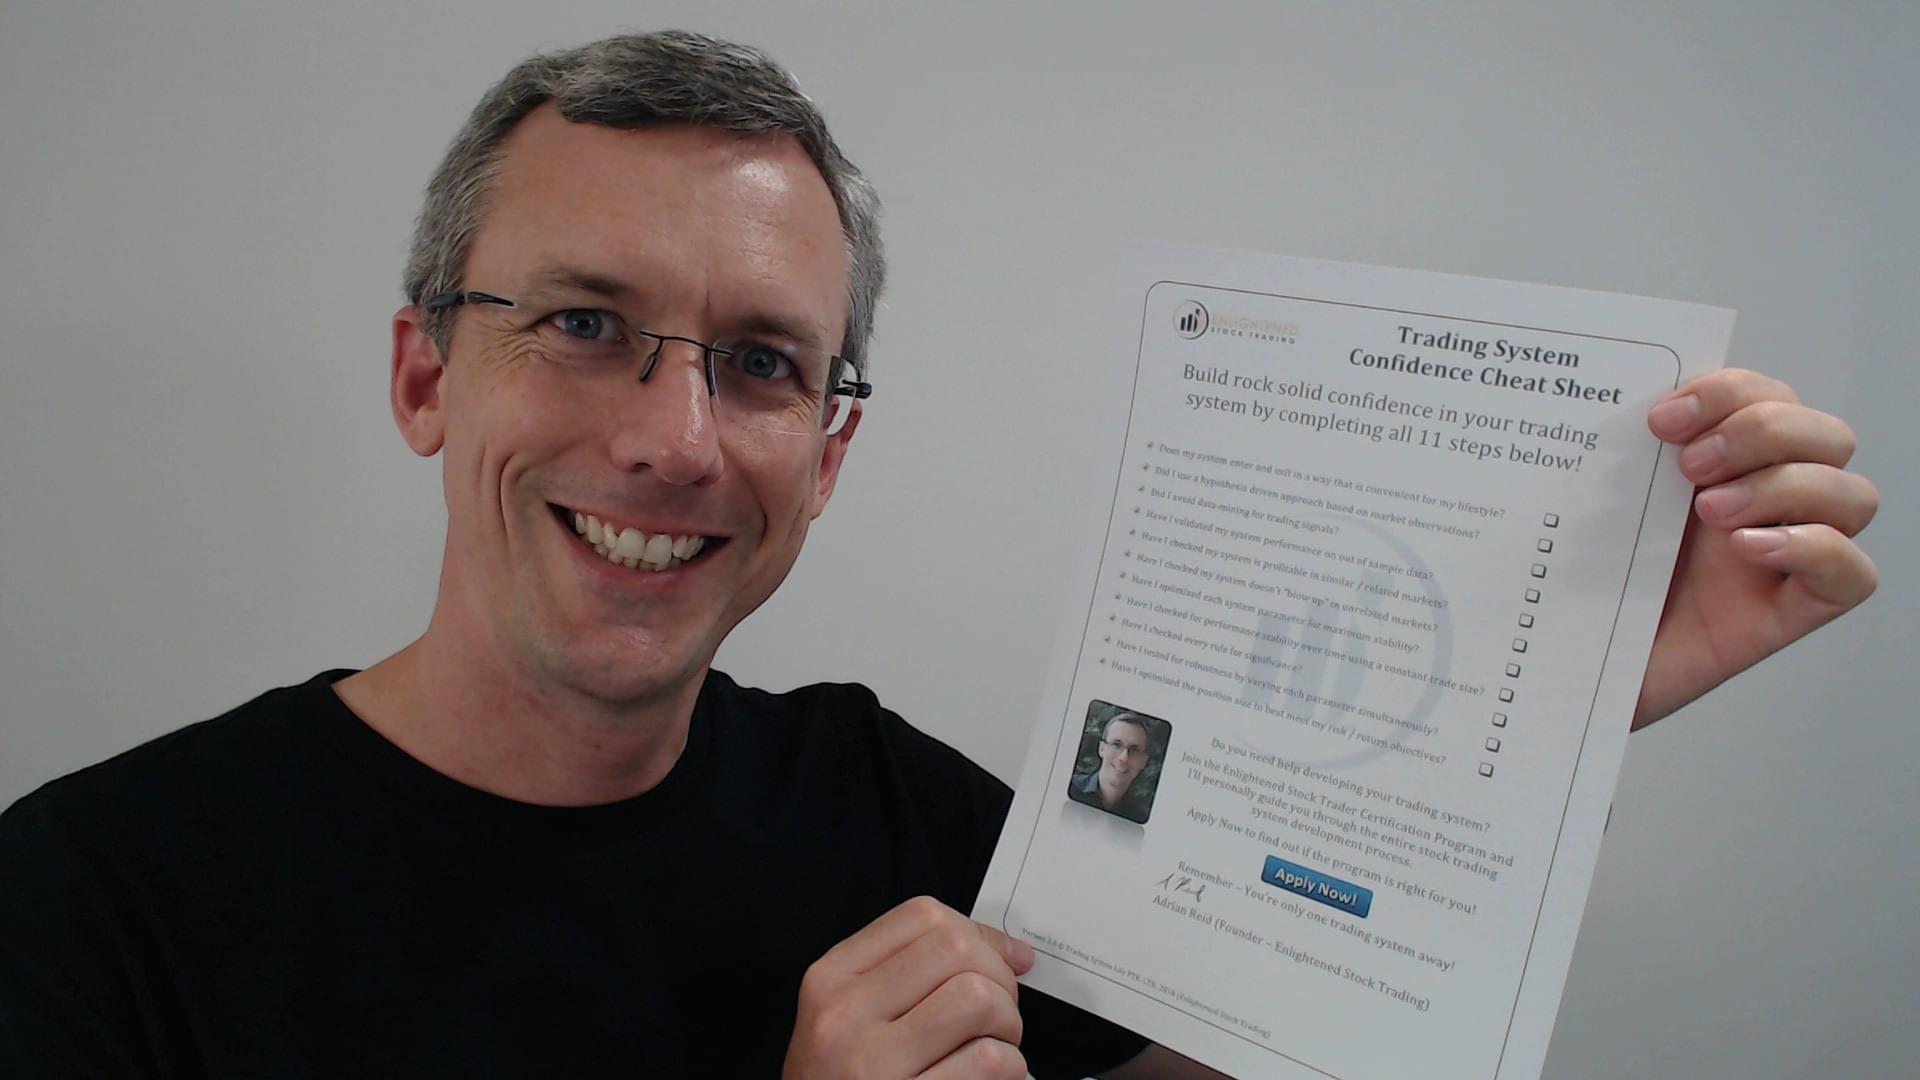 Adrian-Reid-Holding-Trading-System-Confidence-Cheat-Sheet